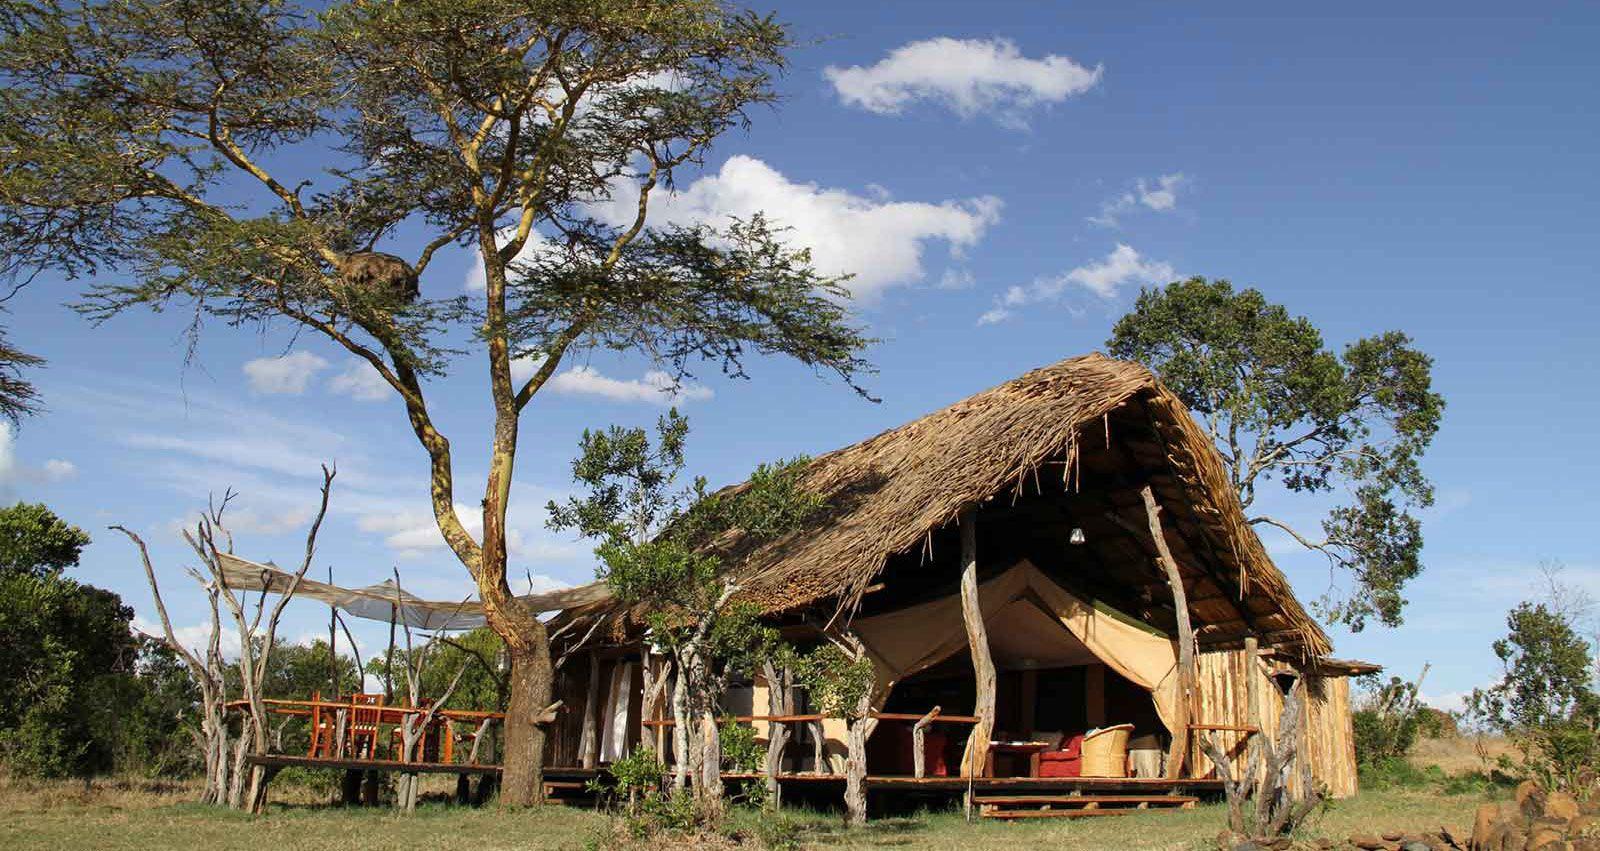 Ekorian's Mugie Camp